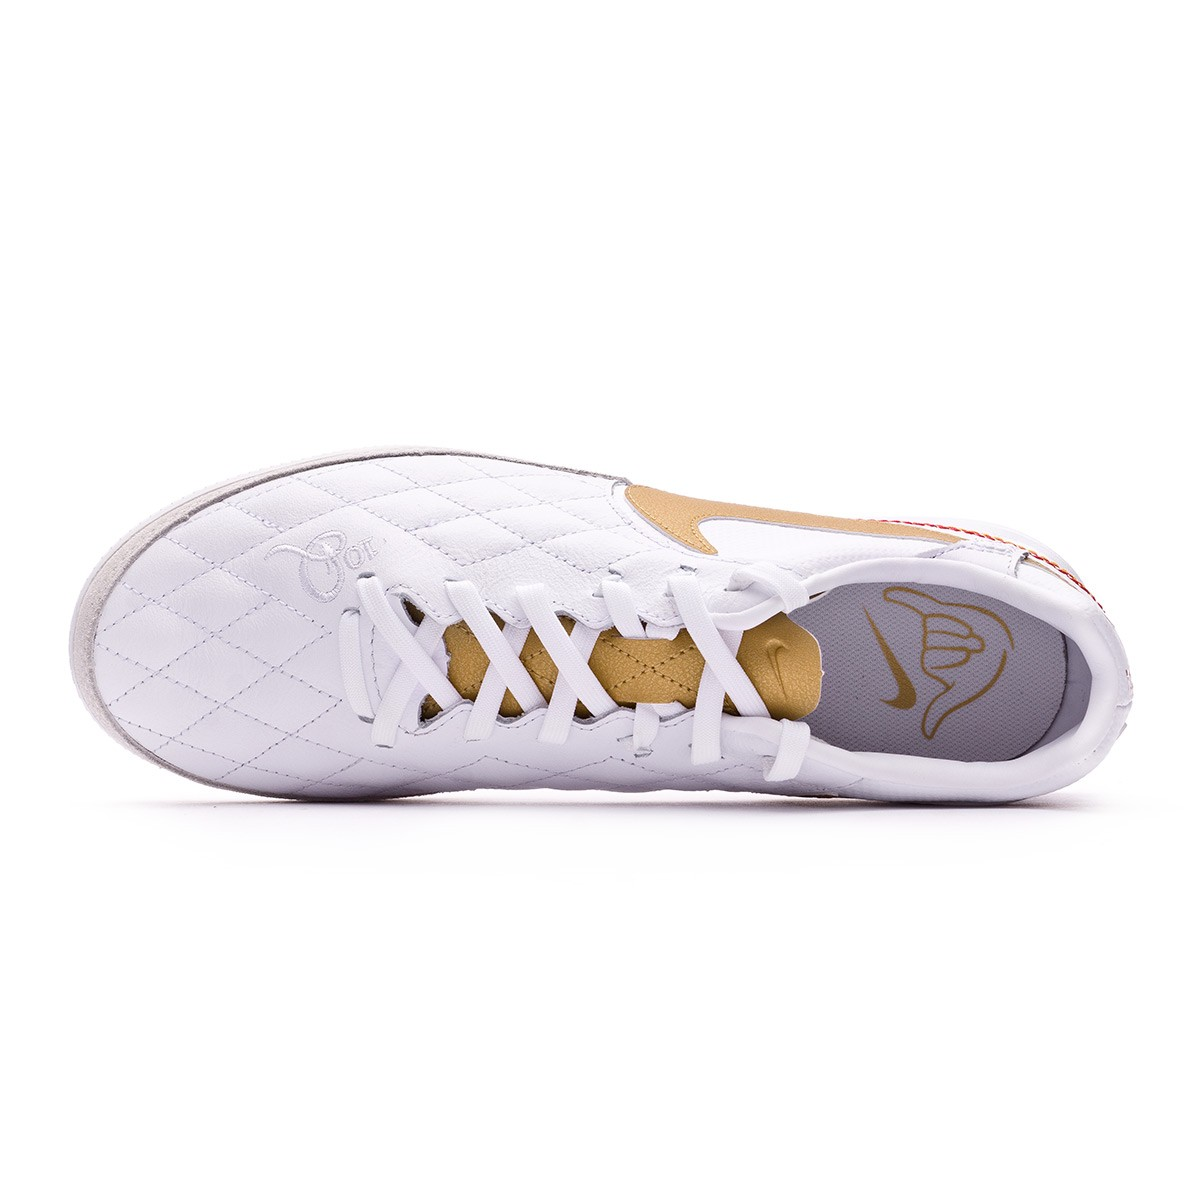 0e94800434ad Futsal Boot Nike Lunar LegendX VII Pro 10R Barcelona IC White-Metallic gold- White - Tienda de fútbol Fútbol Emotion